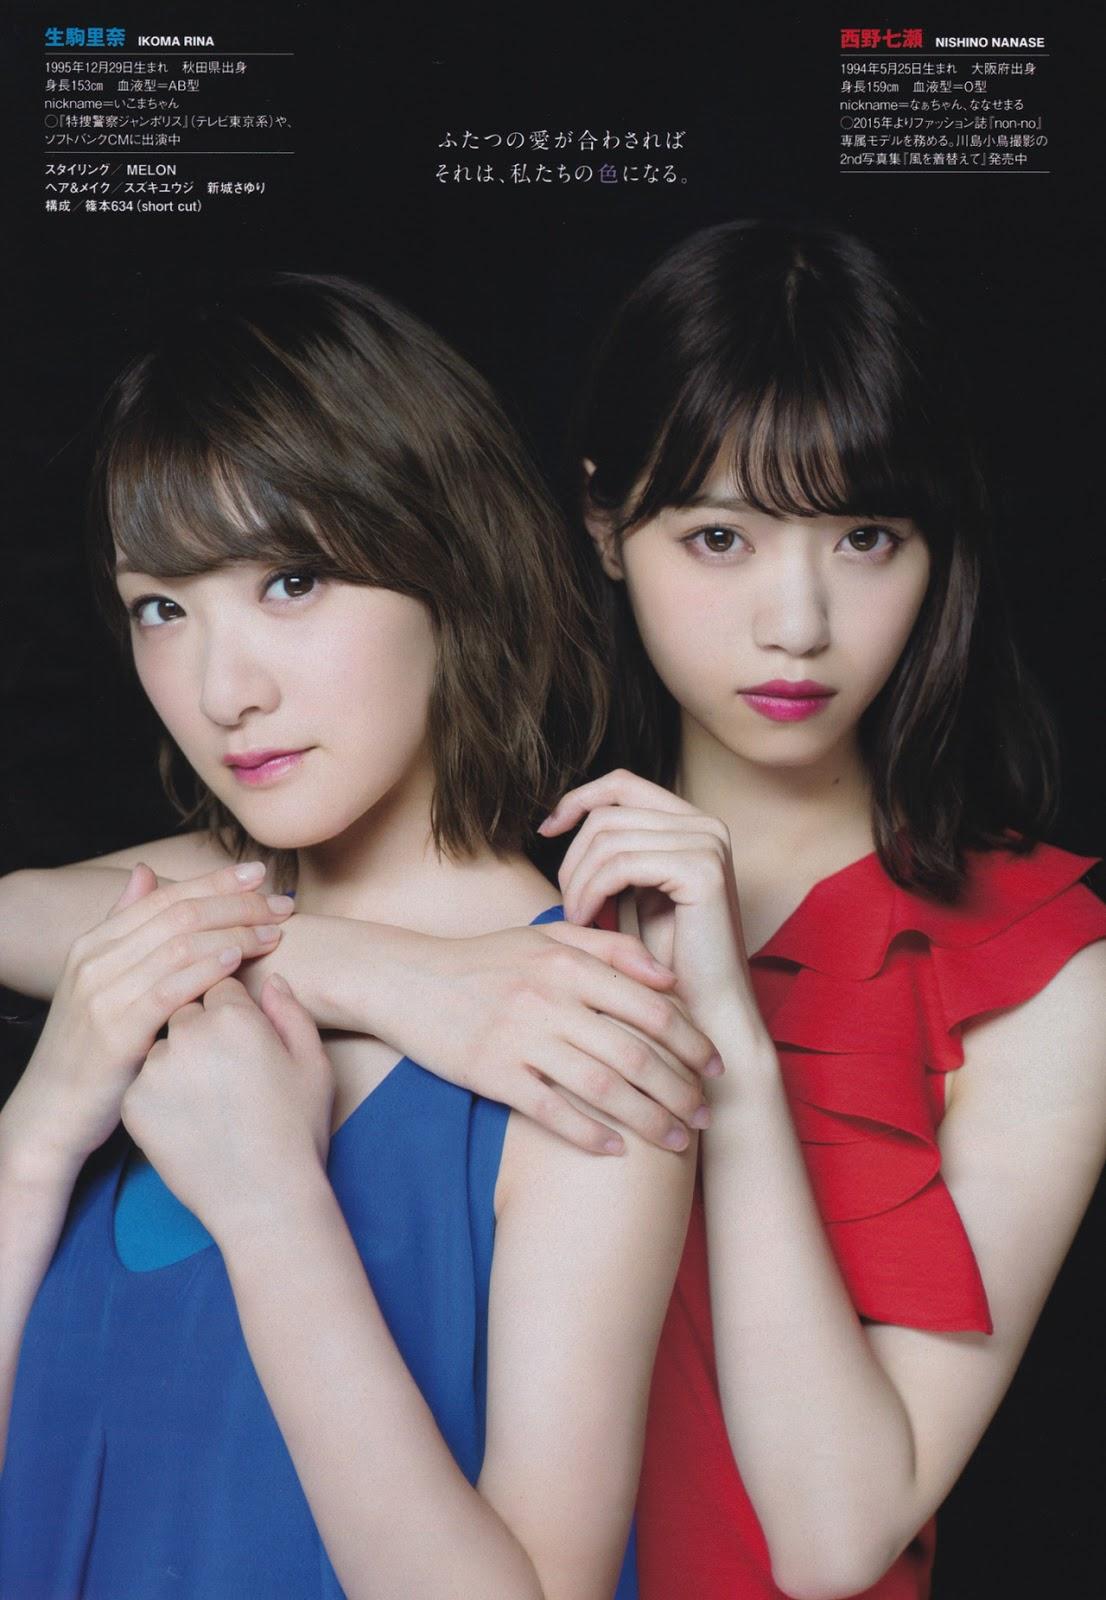 Nishino Nanase 西野七瀬, Ikoma Rina 生駒里奈 Nogizaka46, Weekly Playboy Nogizaka46 Special Edition 2016